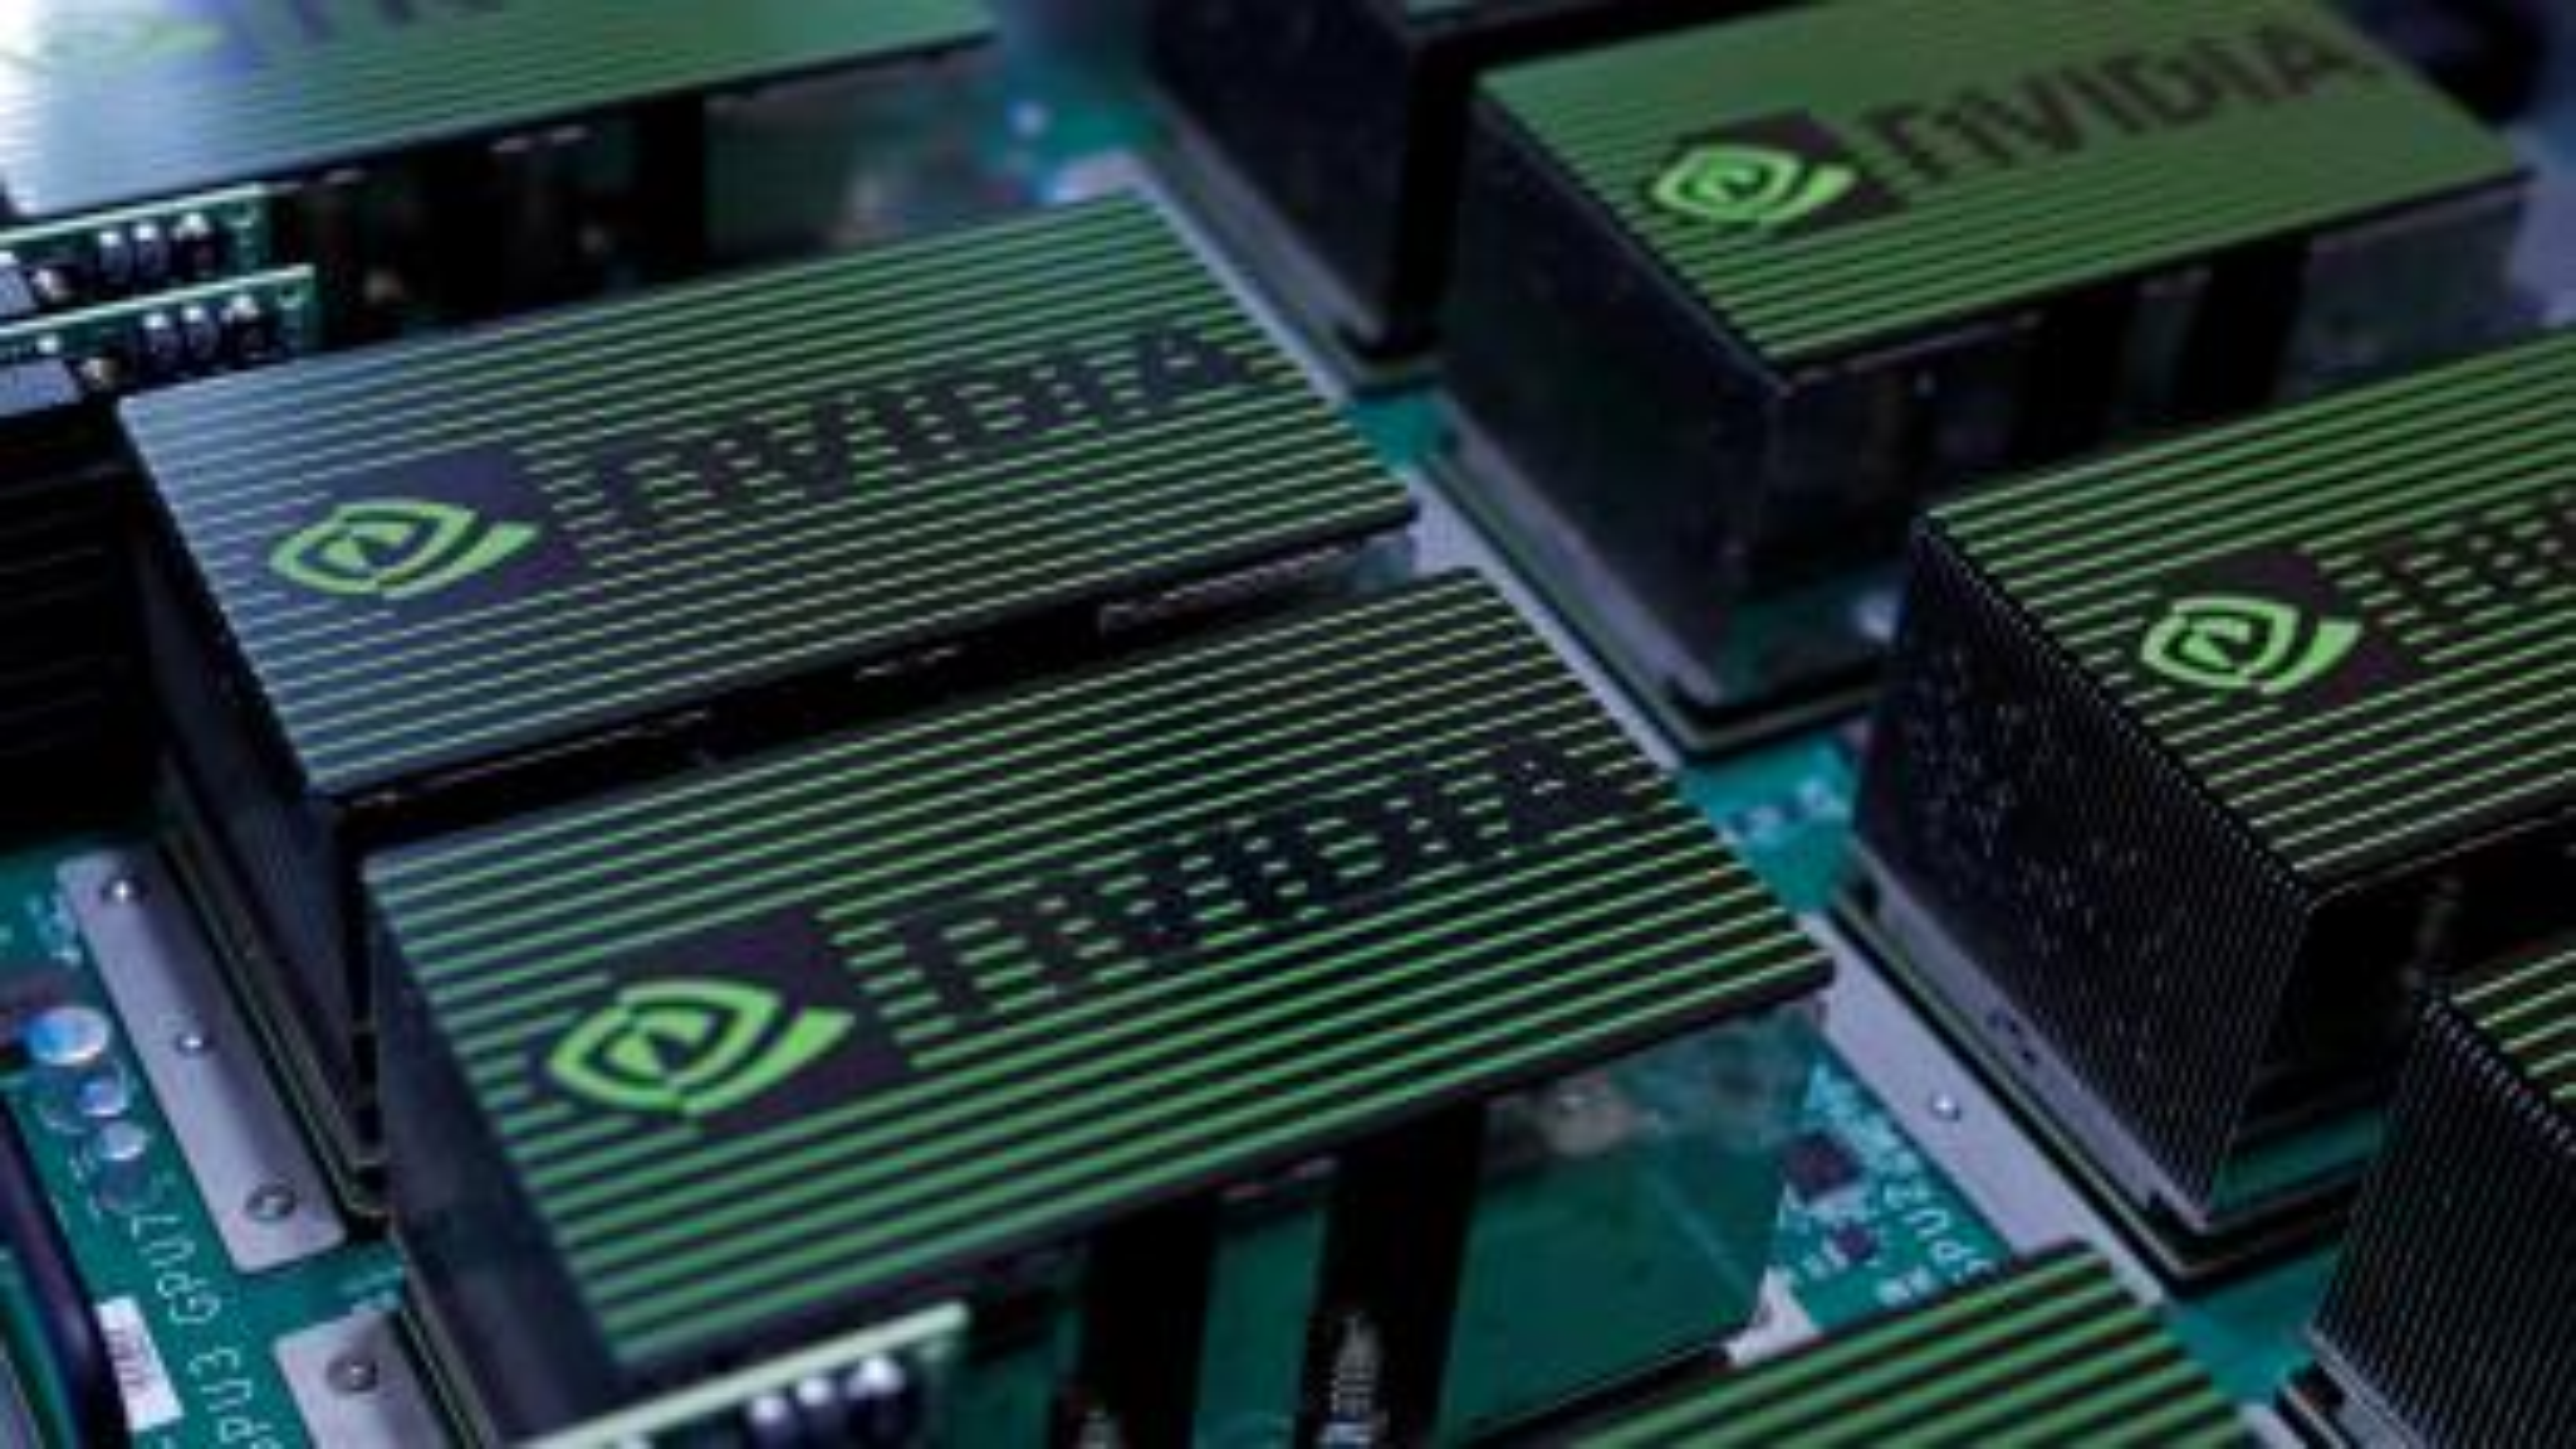 A row of chips dispays the NVIDIA logo.